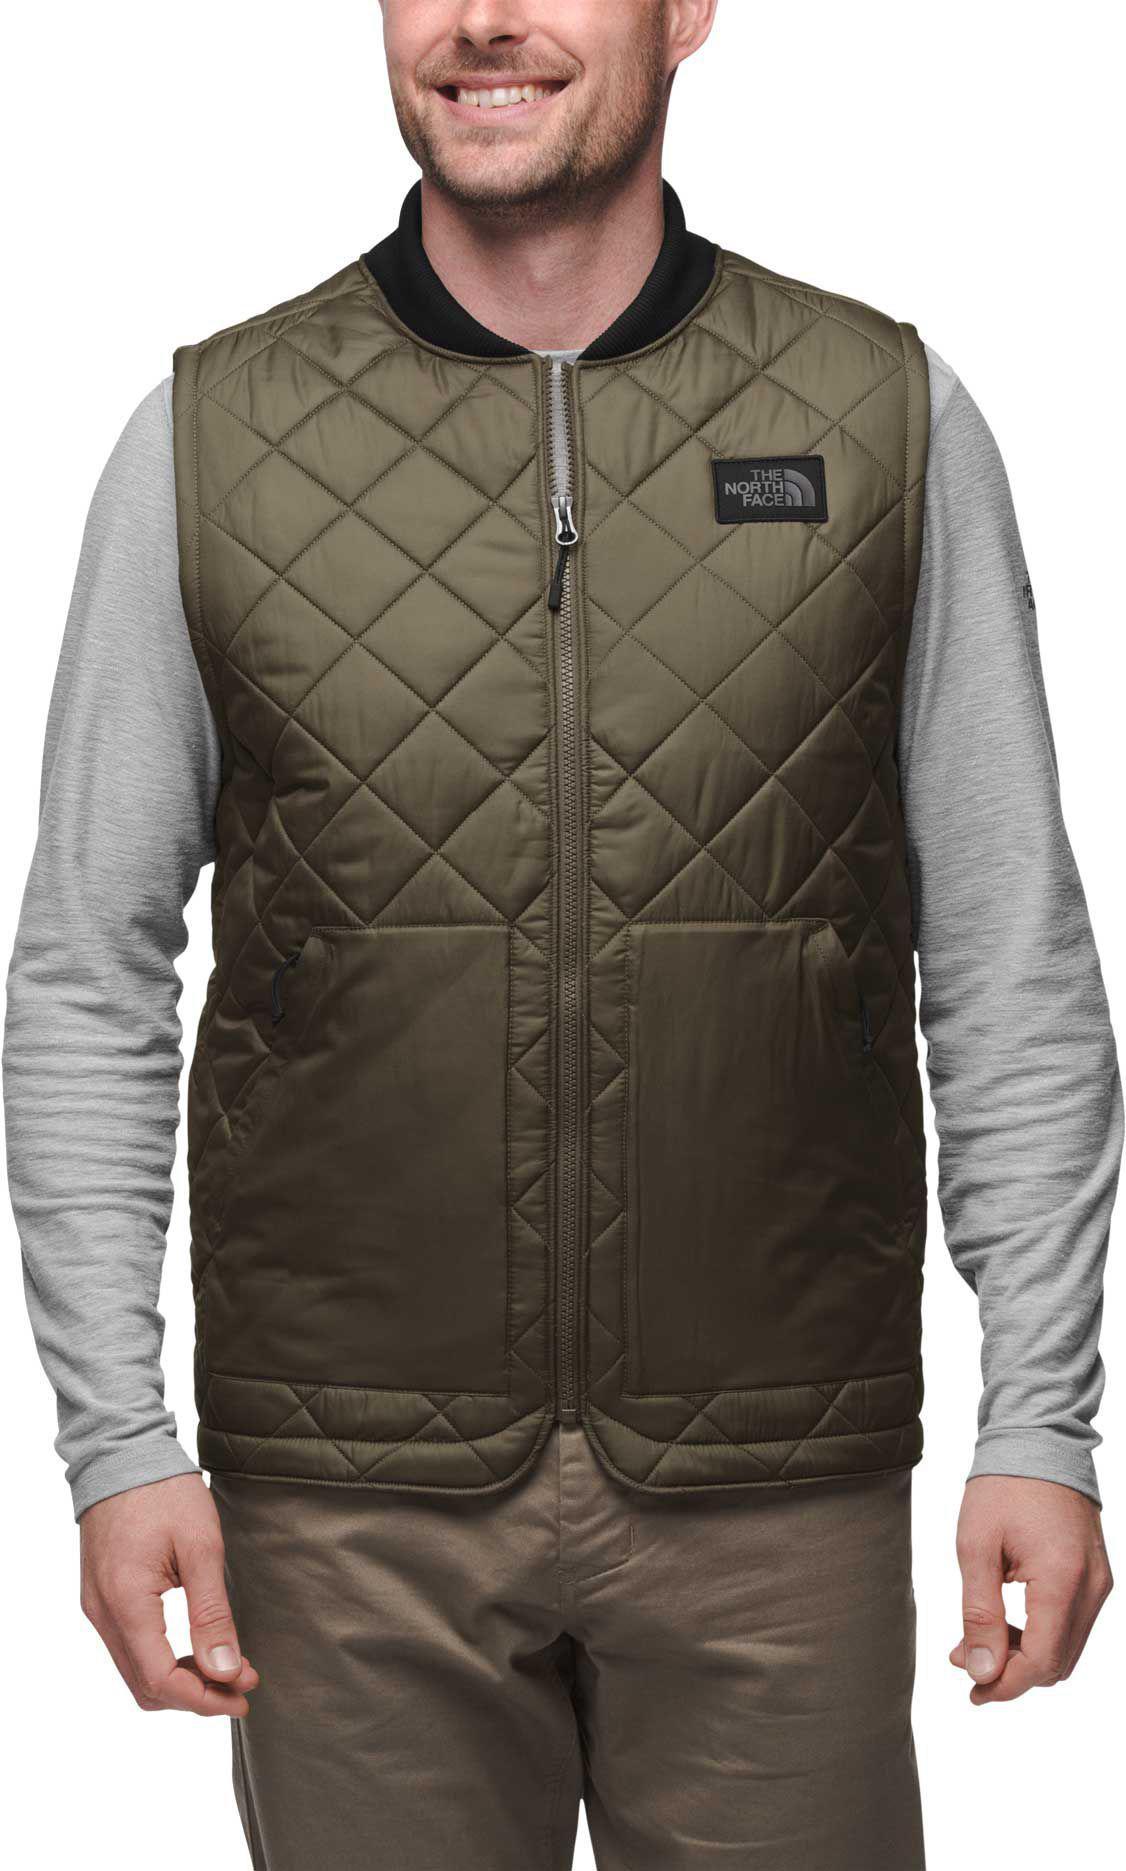 85330111b8c5 Lyst - The North Face Cuchillo Vest in Green for Men